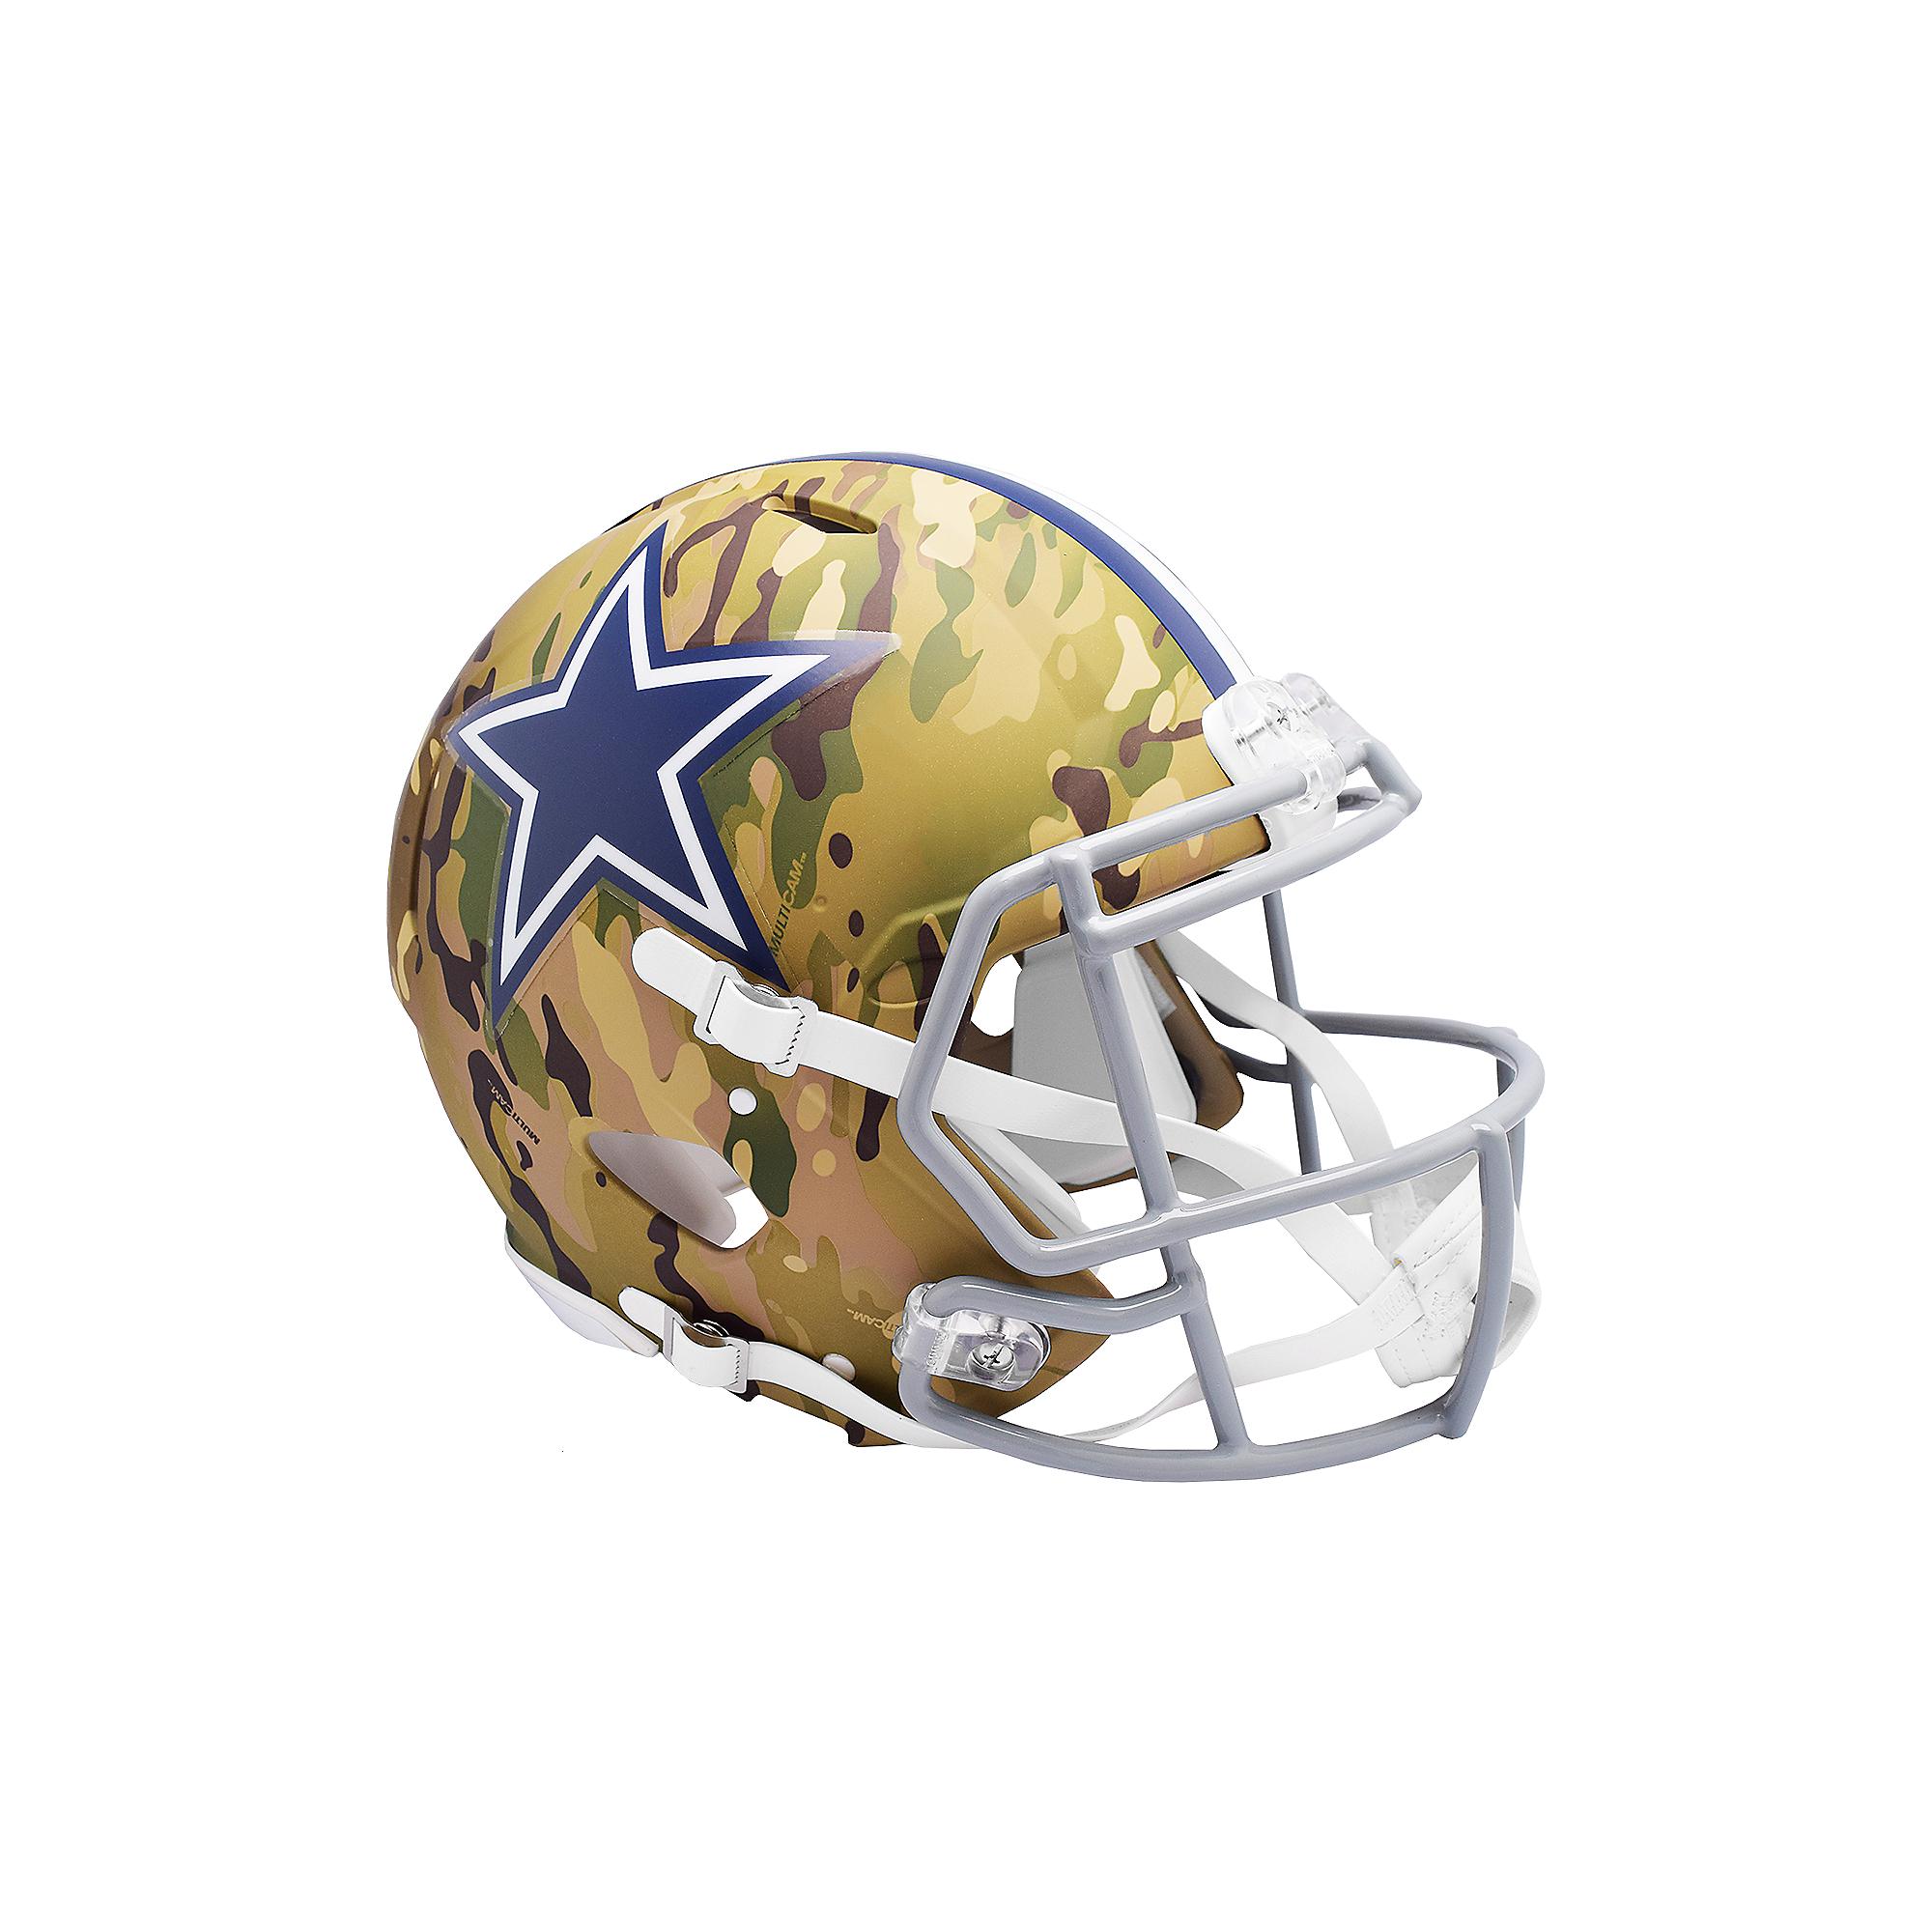 Dallas Cowboys Riddell Camo Speed Authentic Helmet